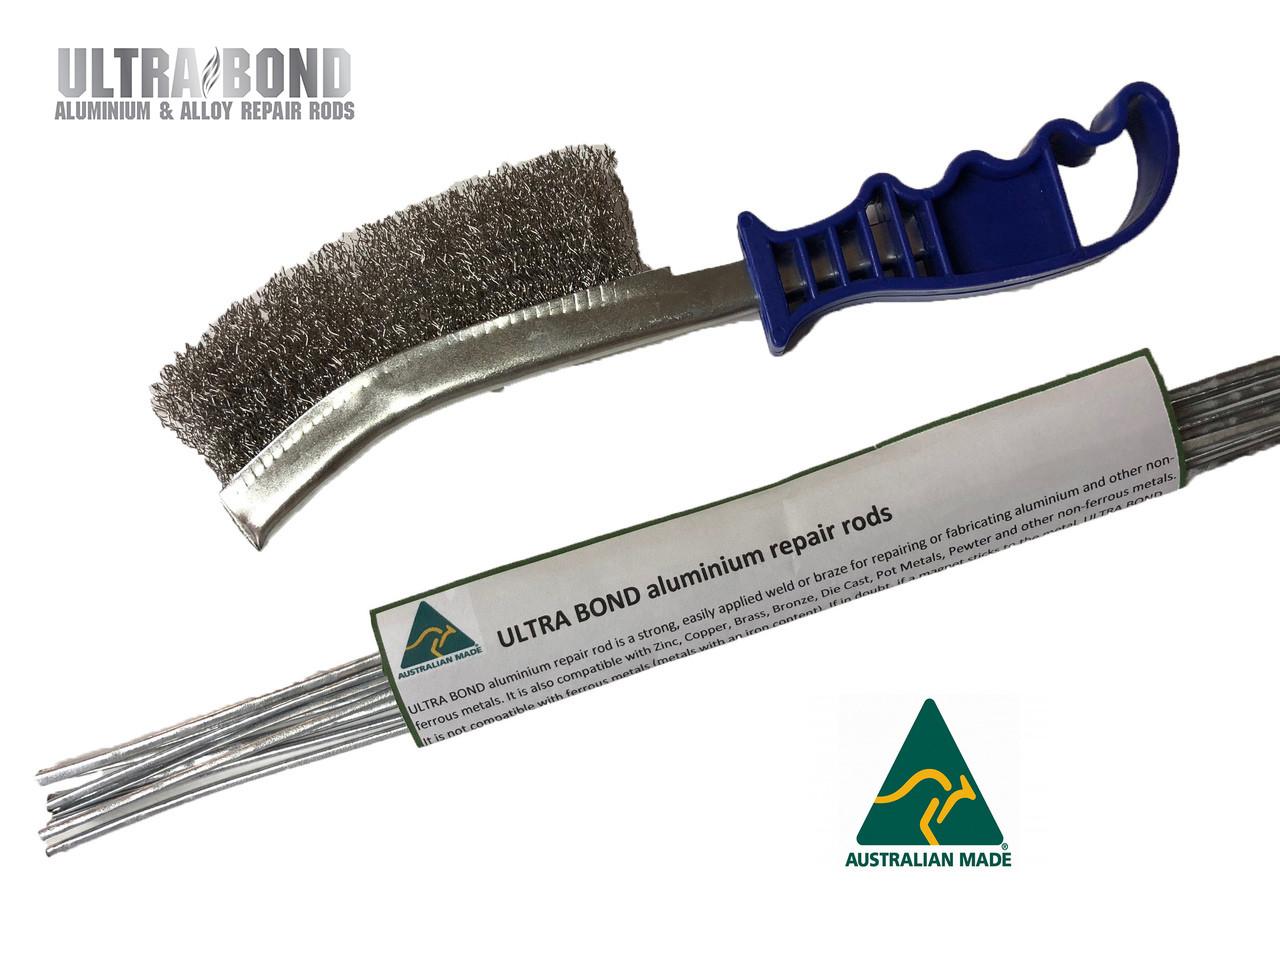 Aluminium repair rods Ultra Bond combo 8x rods plus wire brush Brazing, soldering, welding